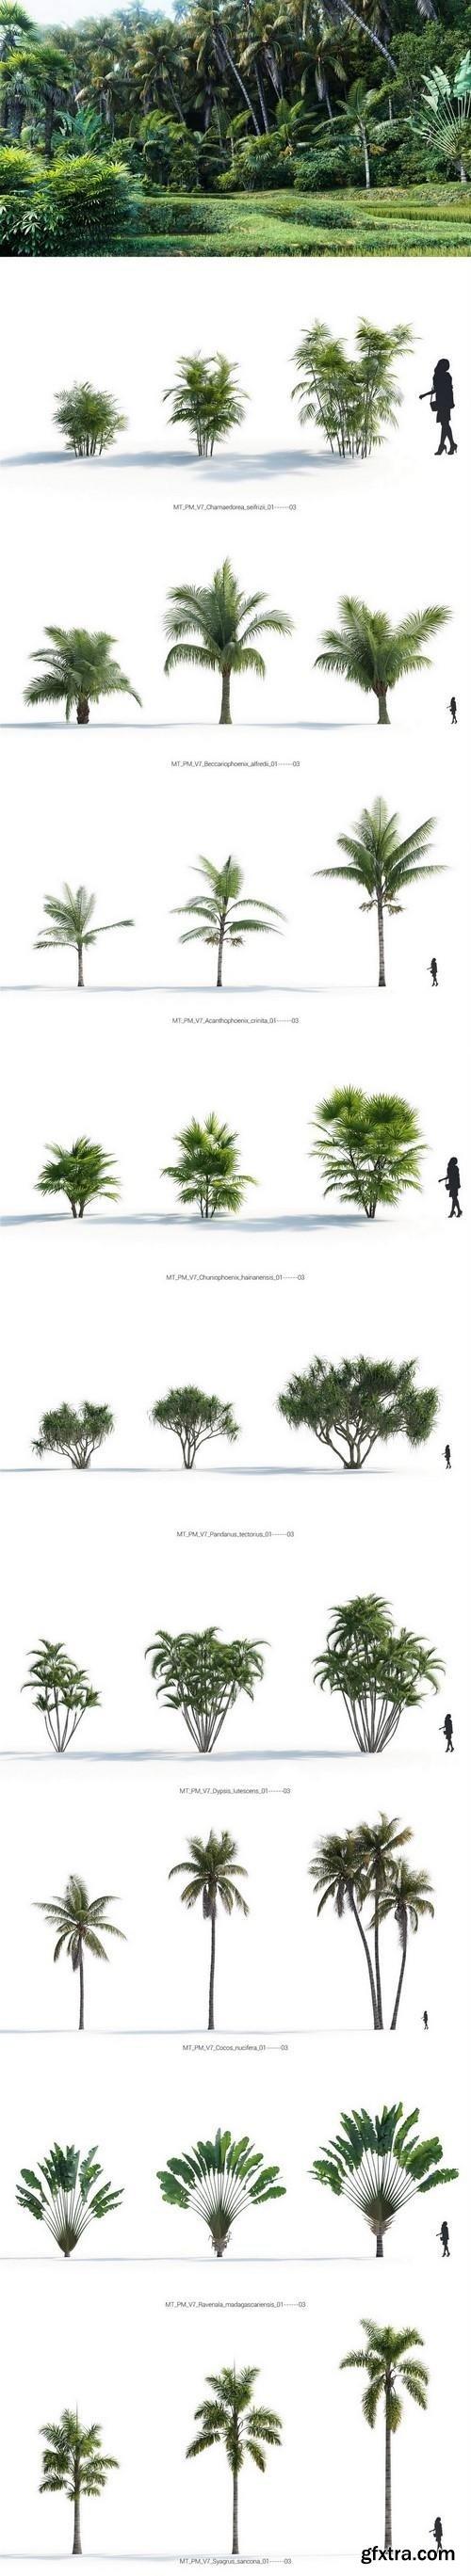 Maxtree - Plant Models Vol 7